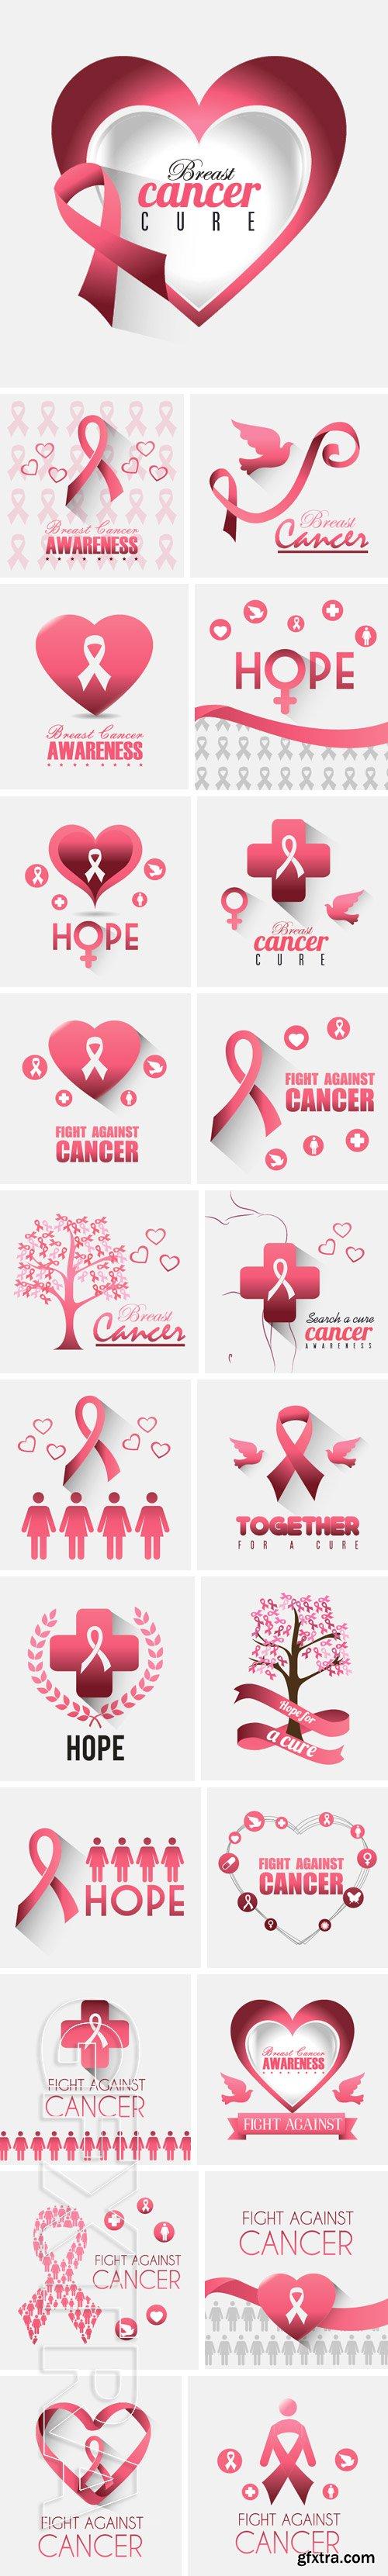 Stock Vectors - Breast cancer design, vector illustration